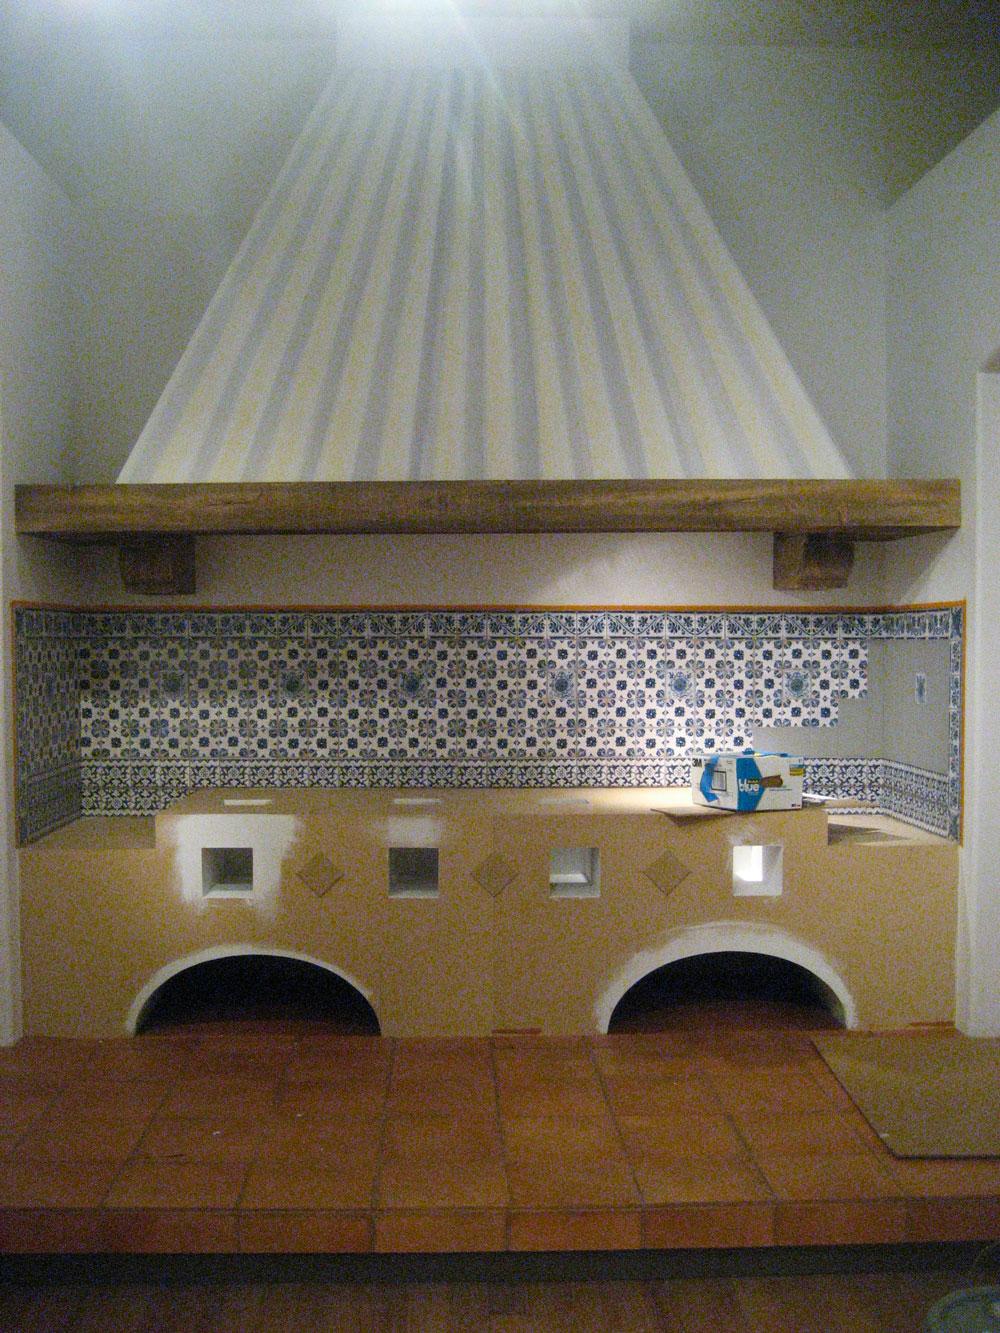 New world cuisine oven installation installation design for Cuisine installation